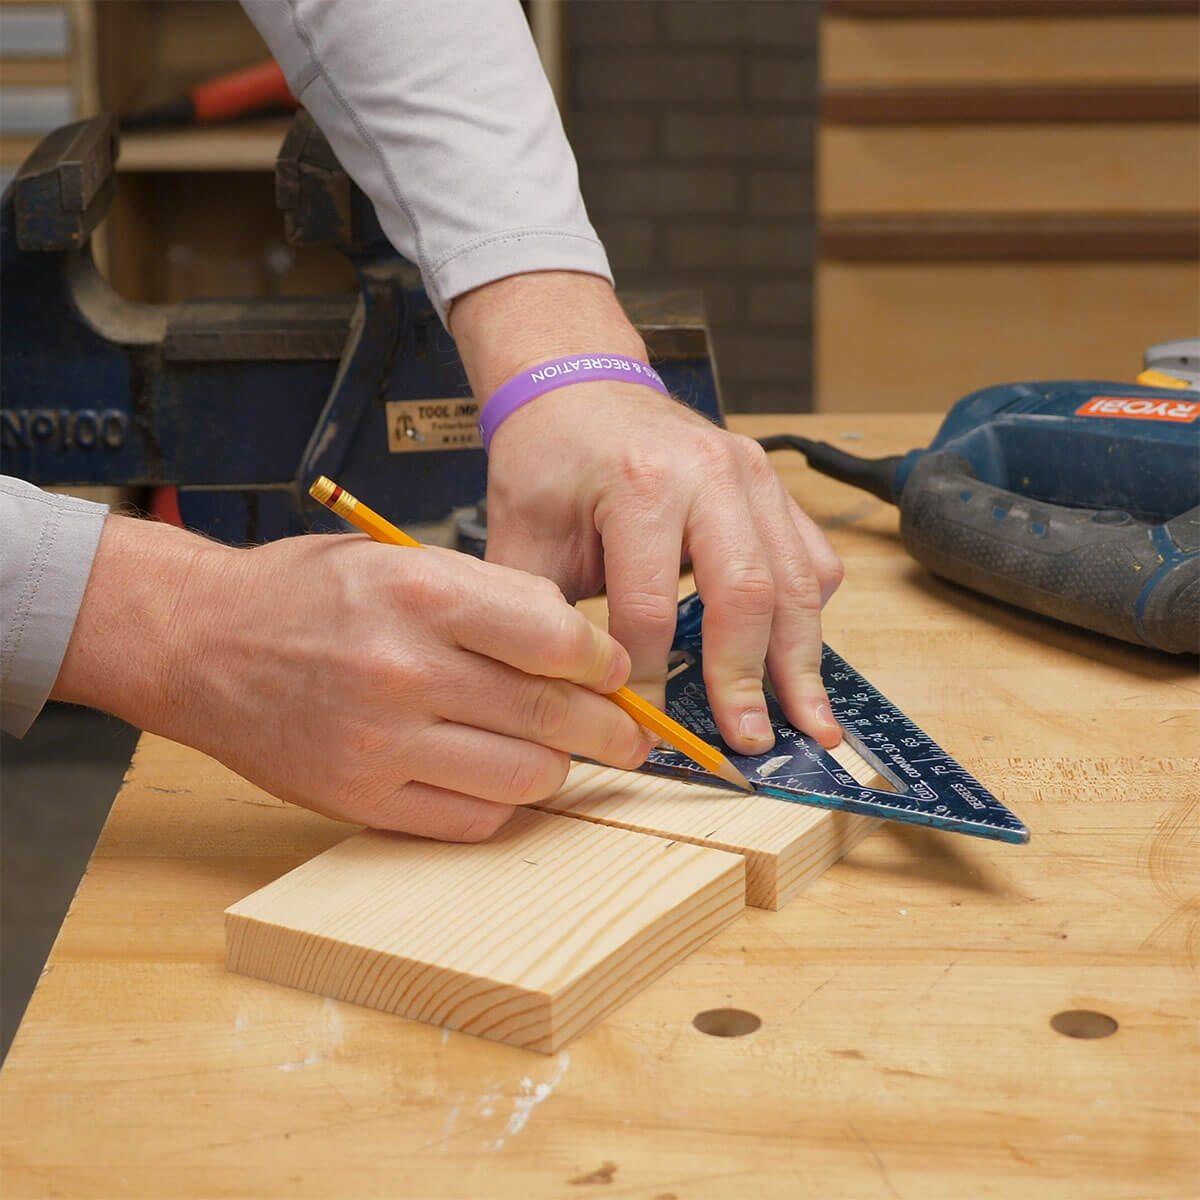 marking wood blocks for mechanics vise